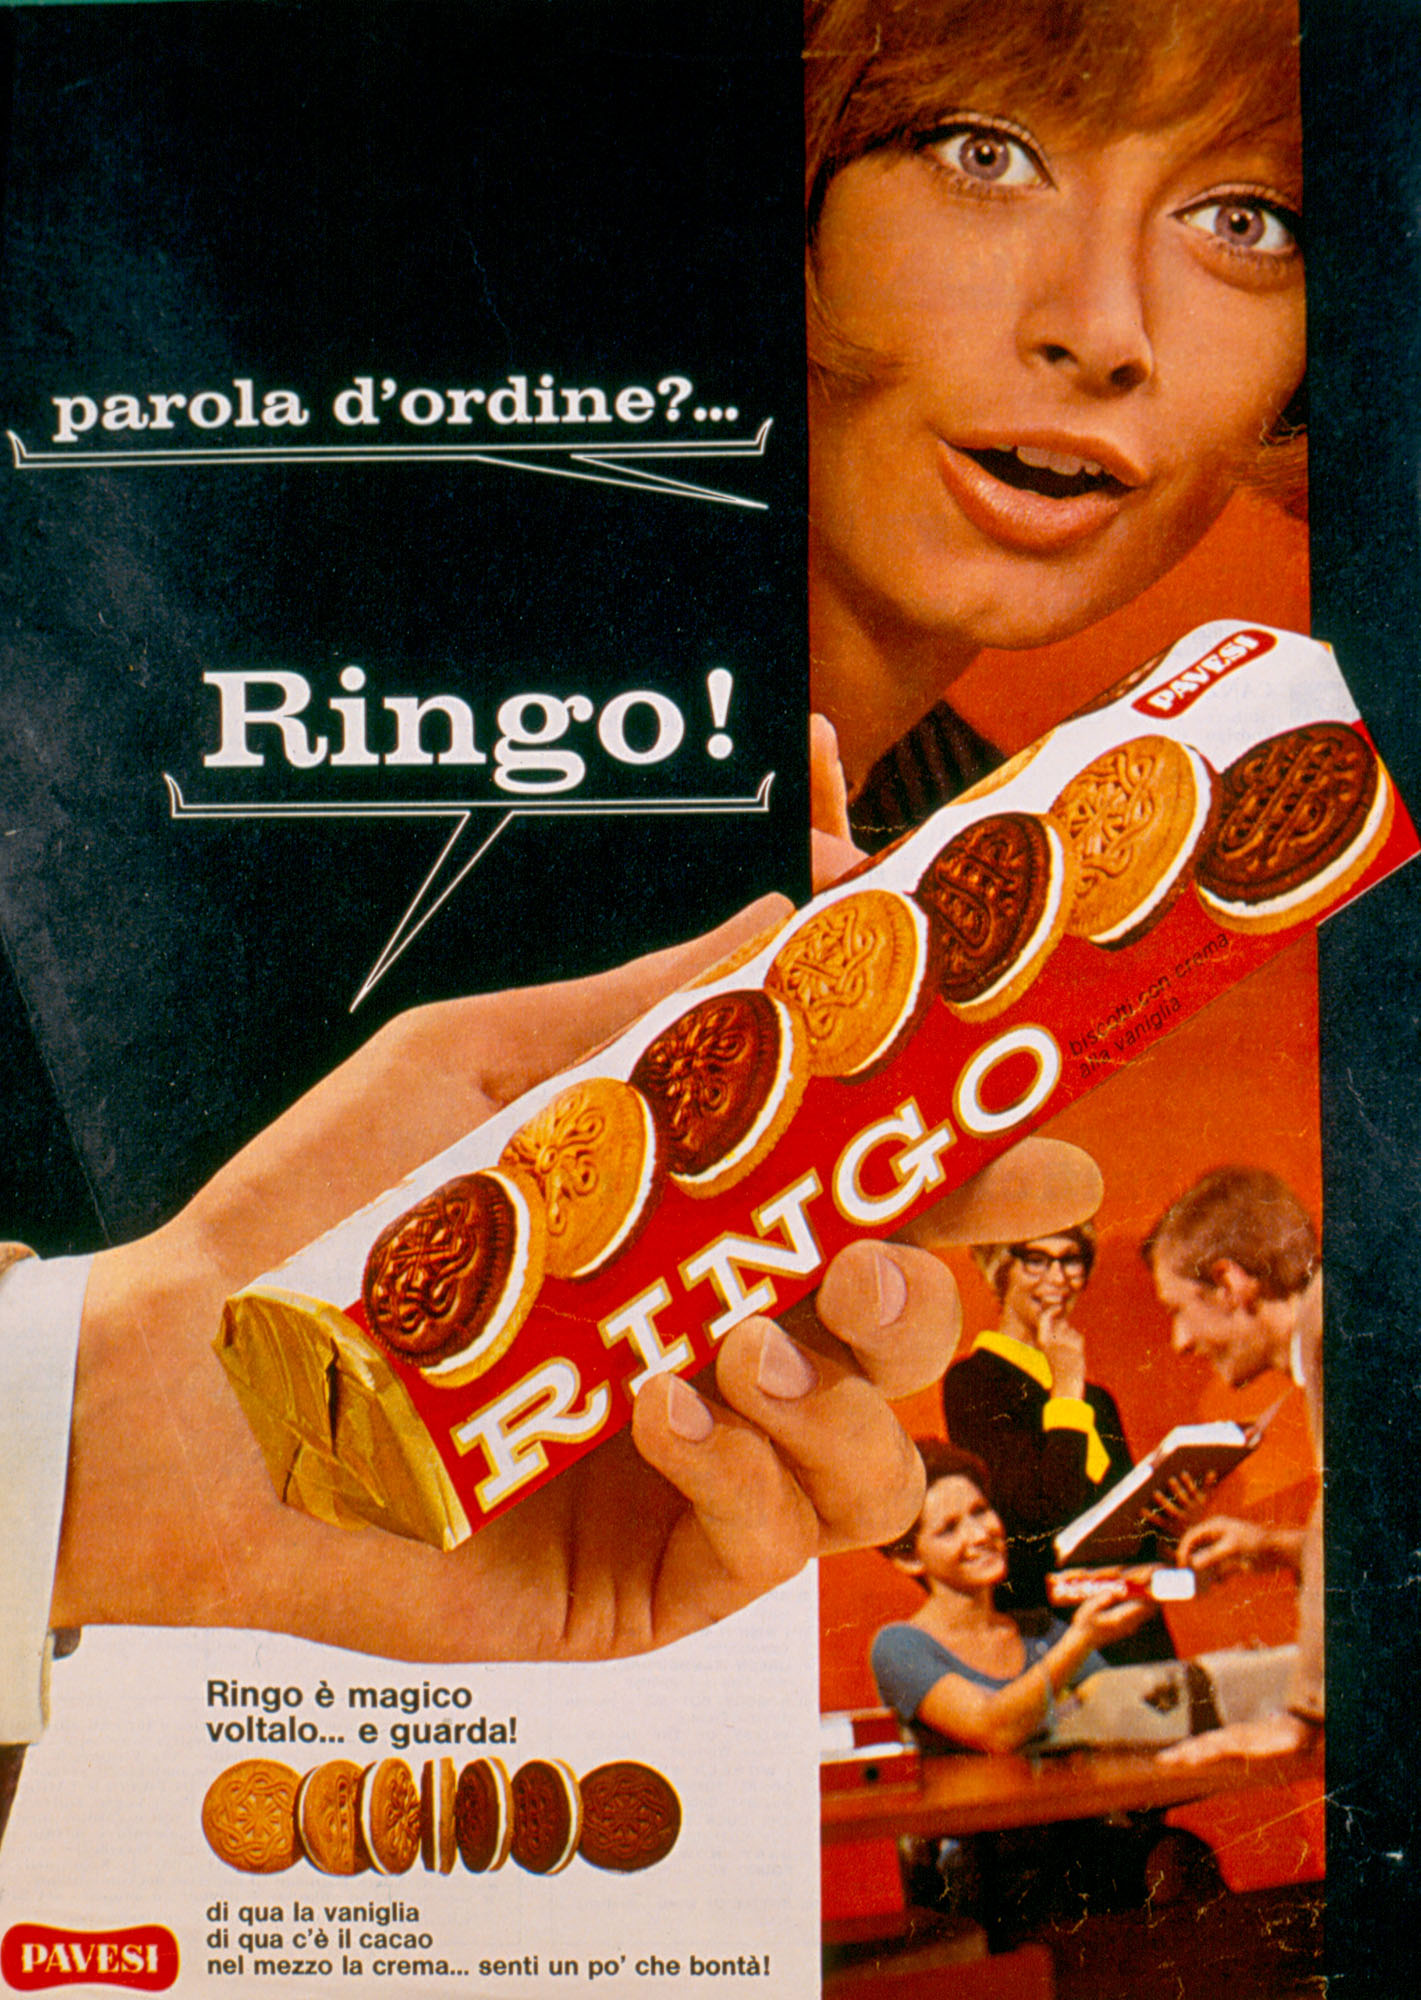 Pubblicità stampa - Parola d'ordine_ Ringo!, 1969